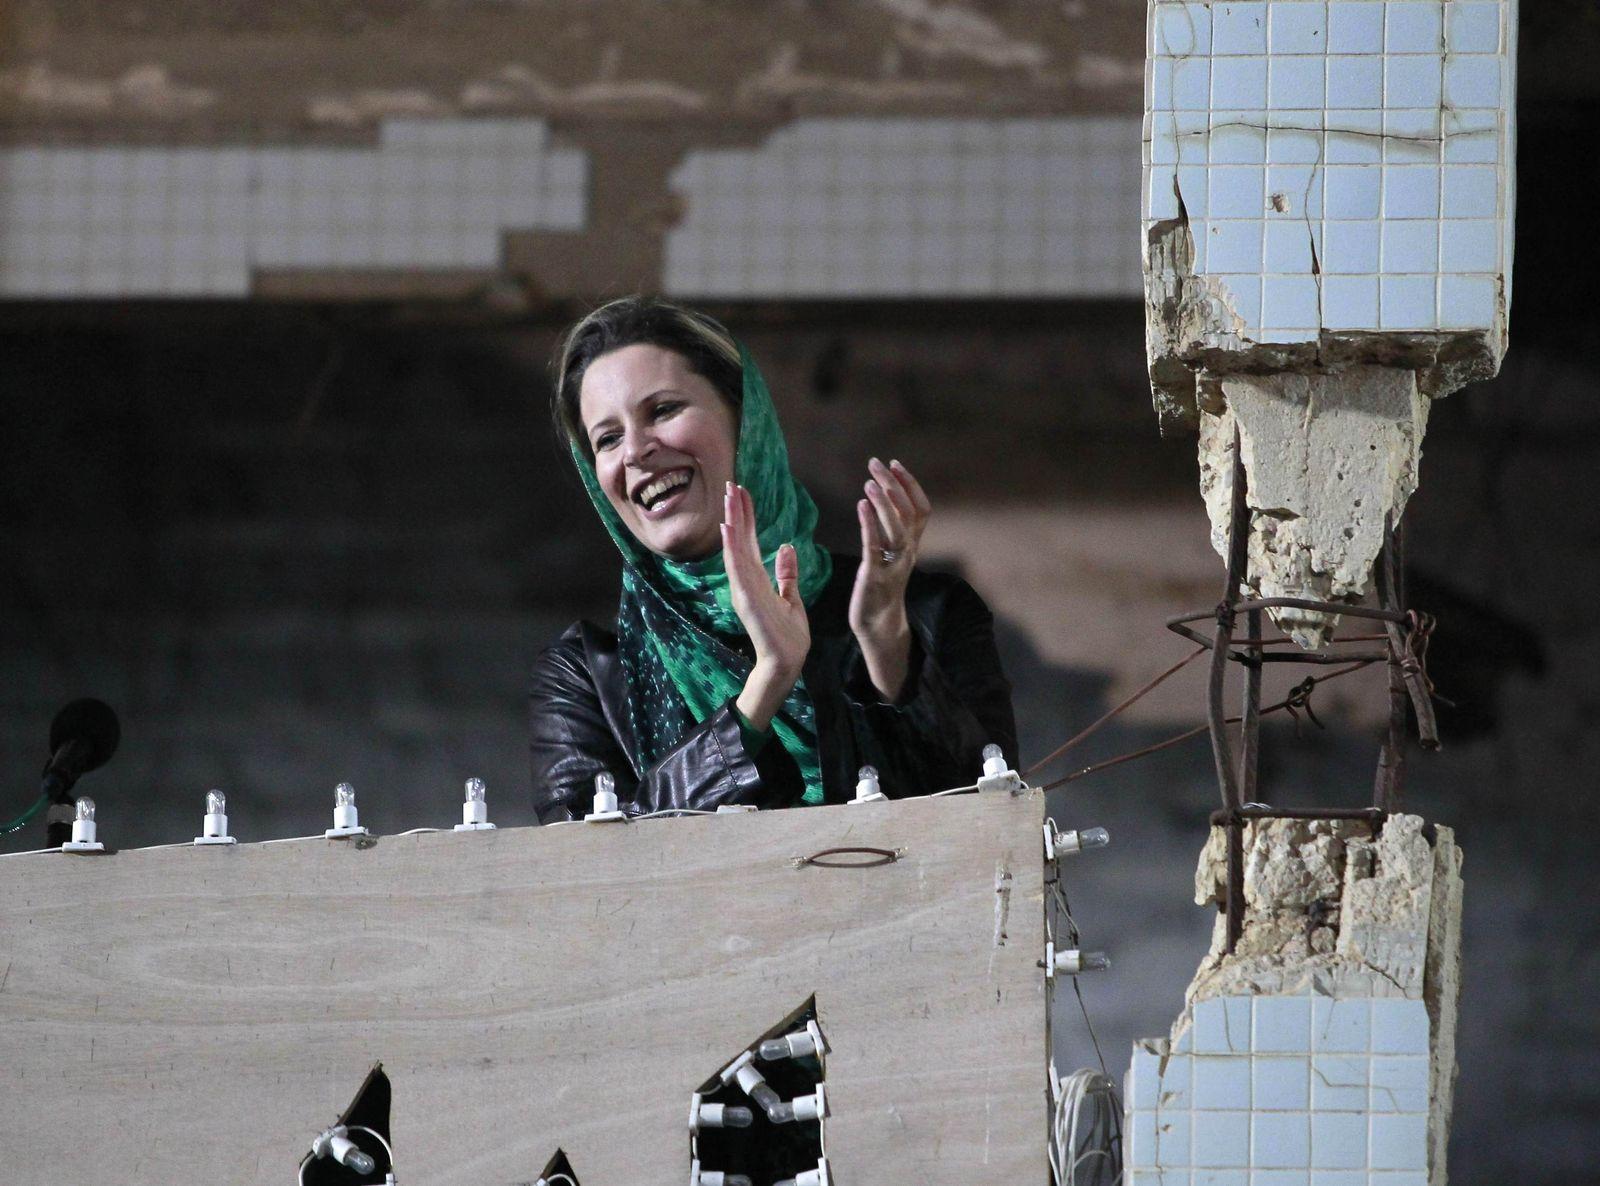 LIBYA-GADDAFI/DAUGHTER